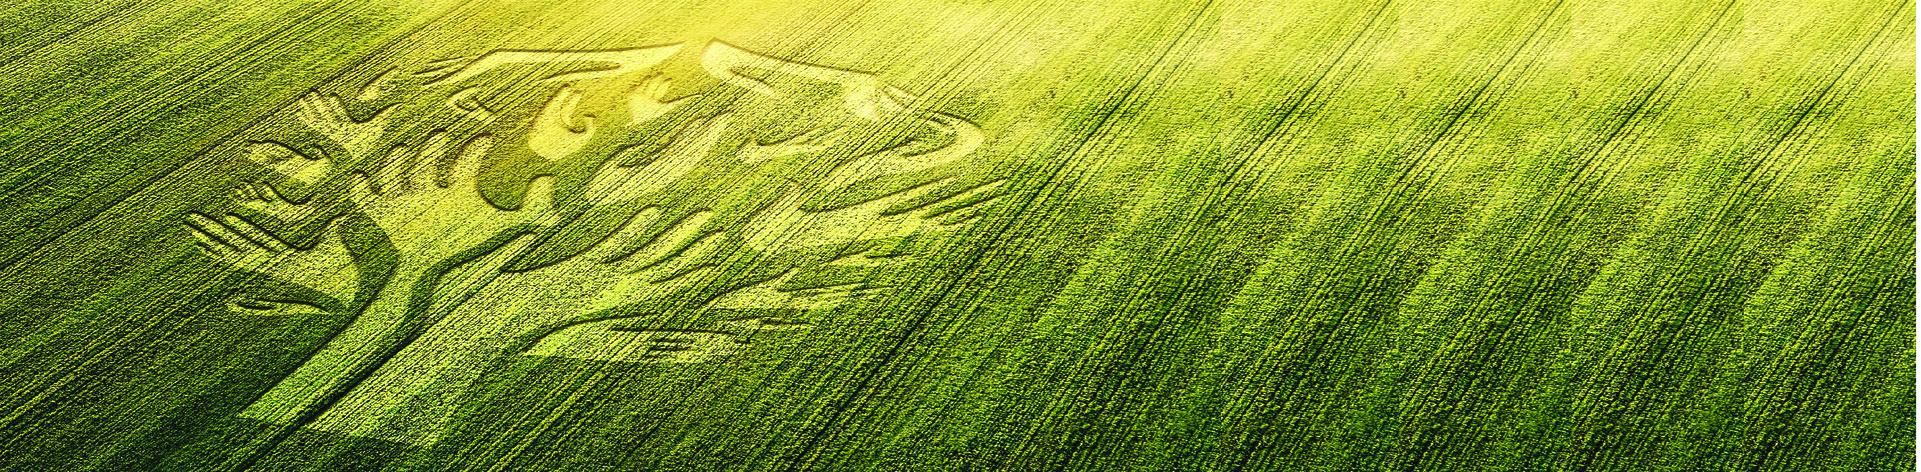 https://www.agriculture.gov.ma/sites/default/files/revslider/image/Accueil%20Cadre%20juridique%20%281%29.png